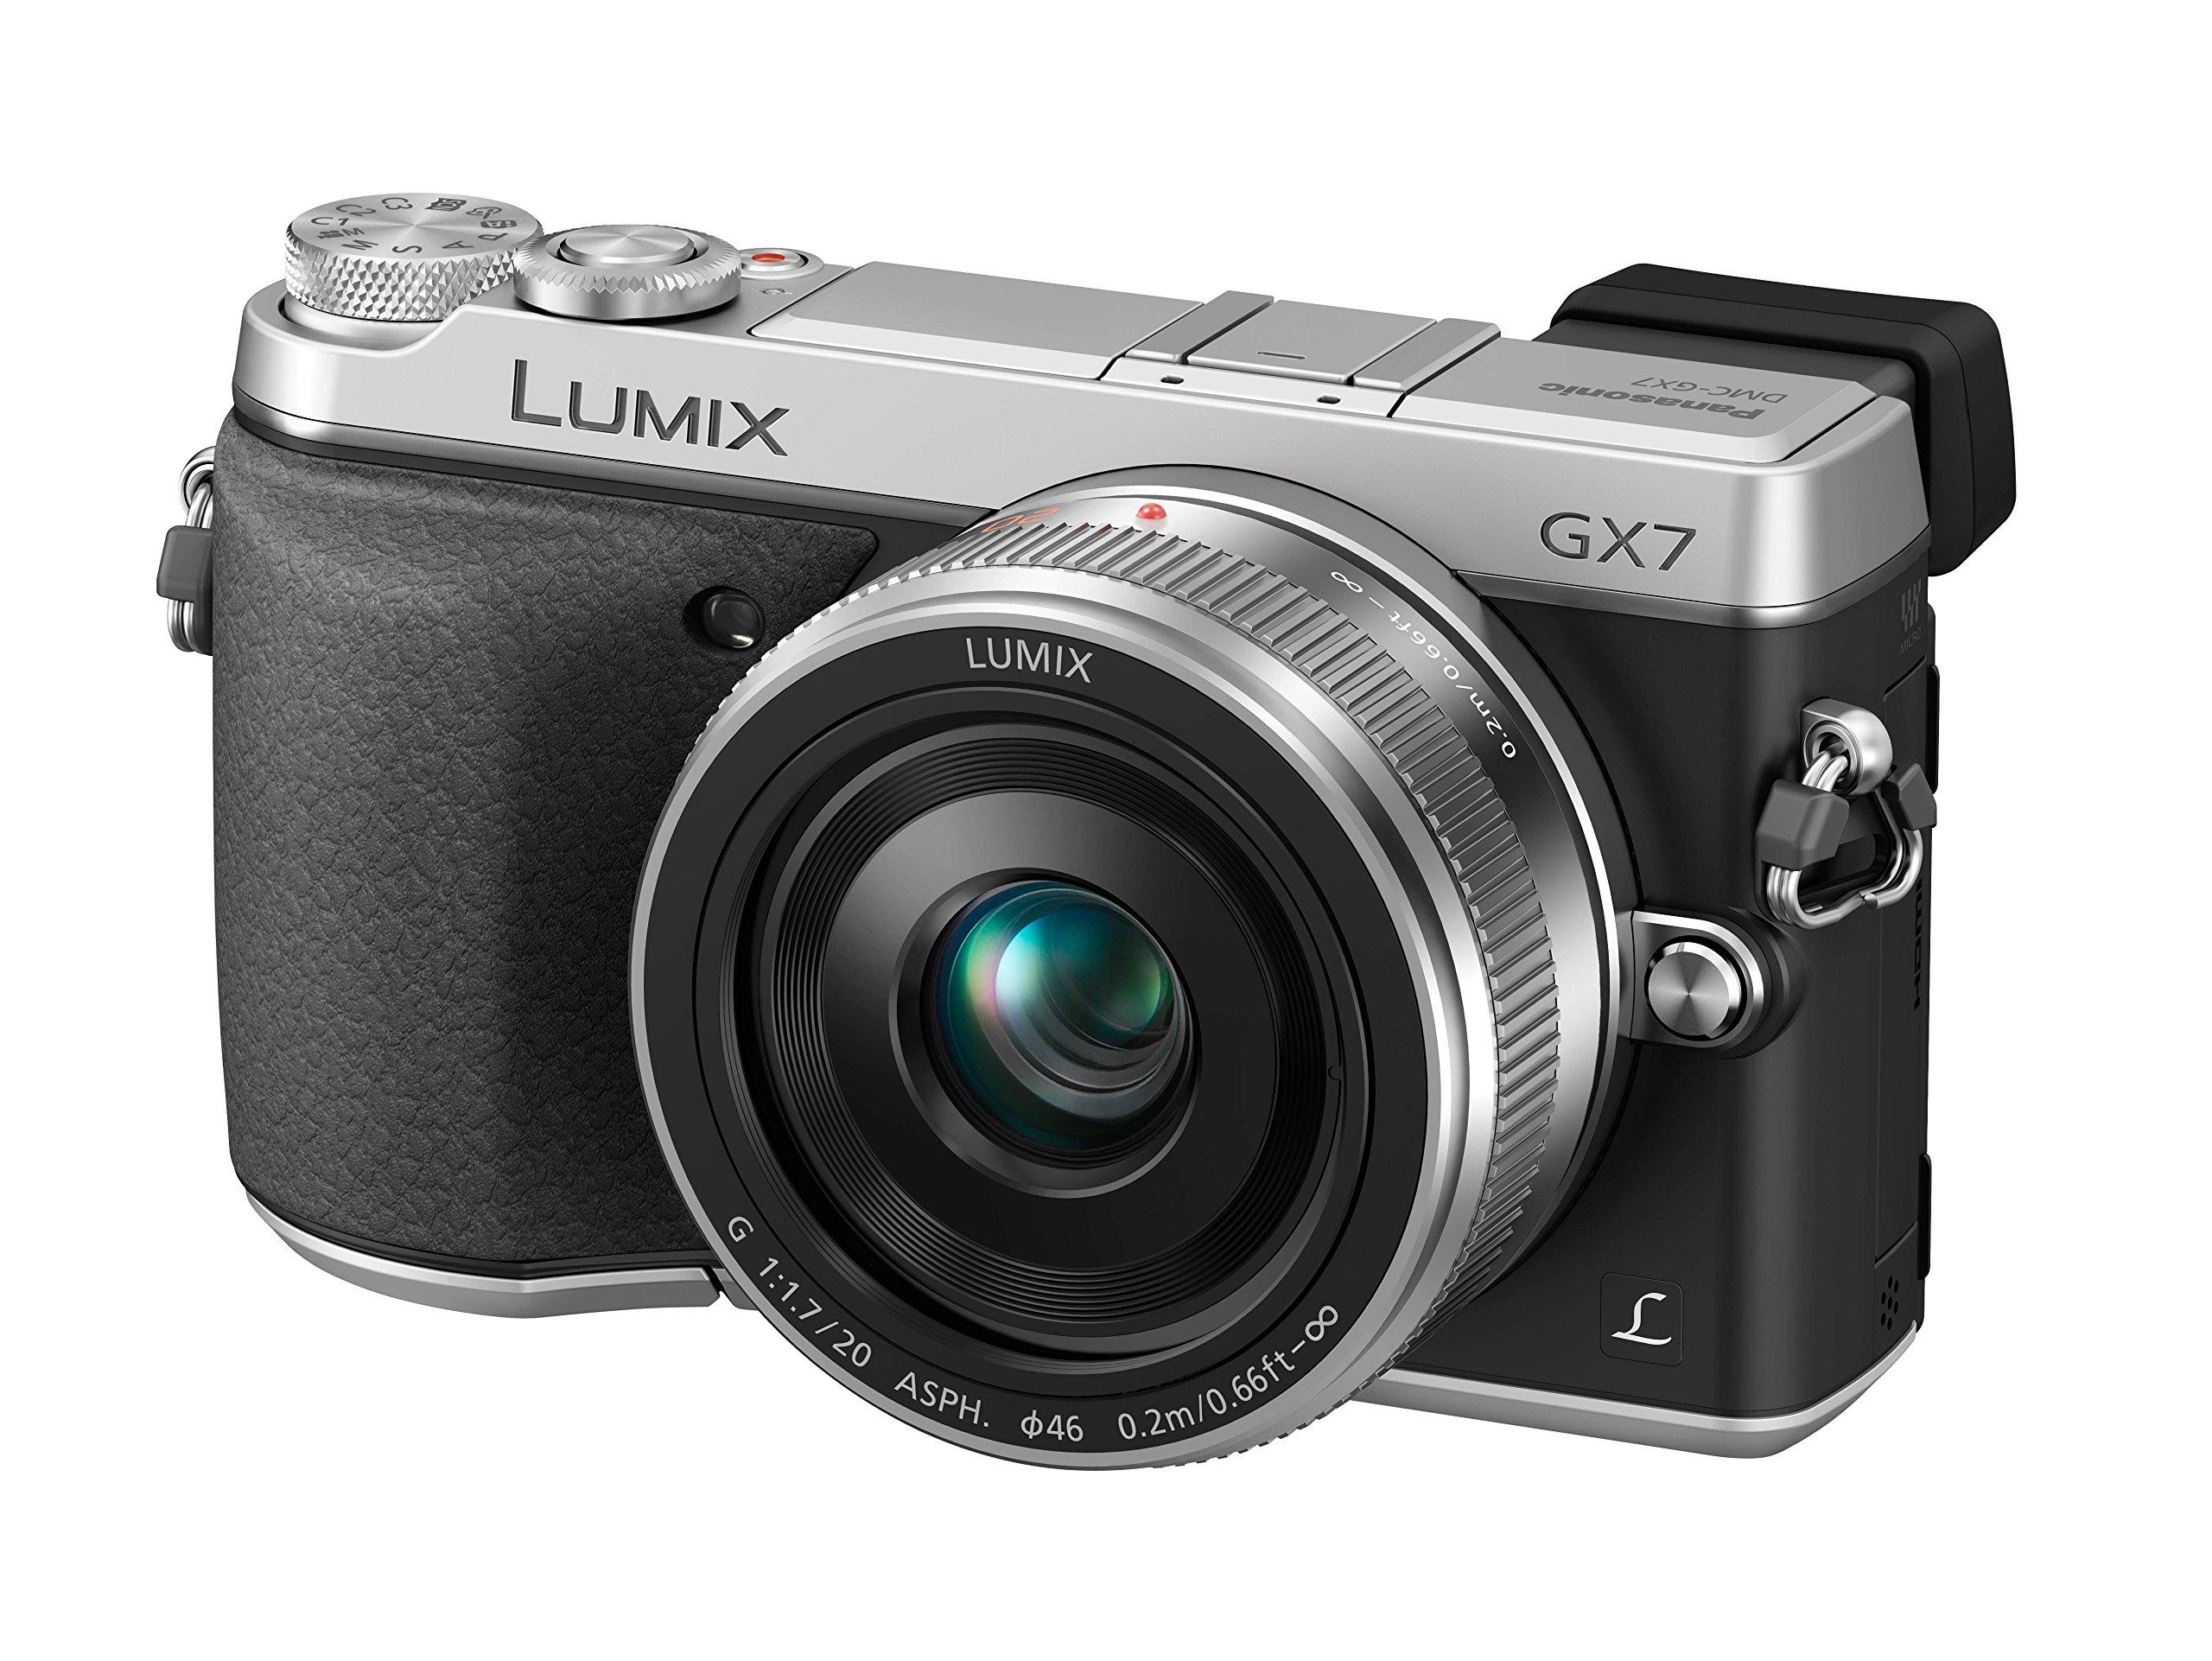 Panasonic DMC-GX7CEG-S Fotocamera Mirrorless, Lente LEICA, Obiettivo 20 mm, Micro 4/3, Wi-Fi, NFC, Argento product image